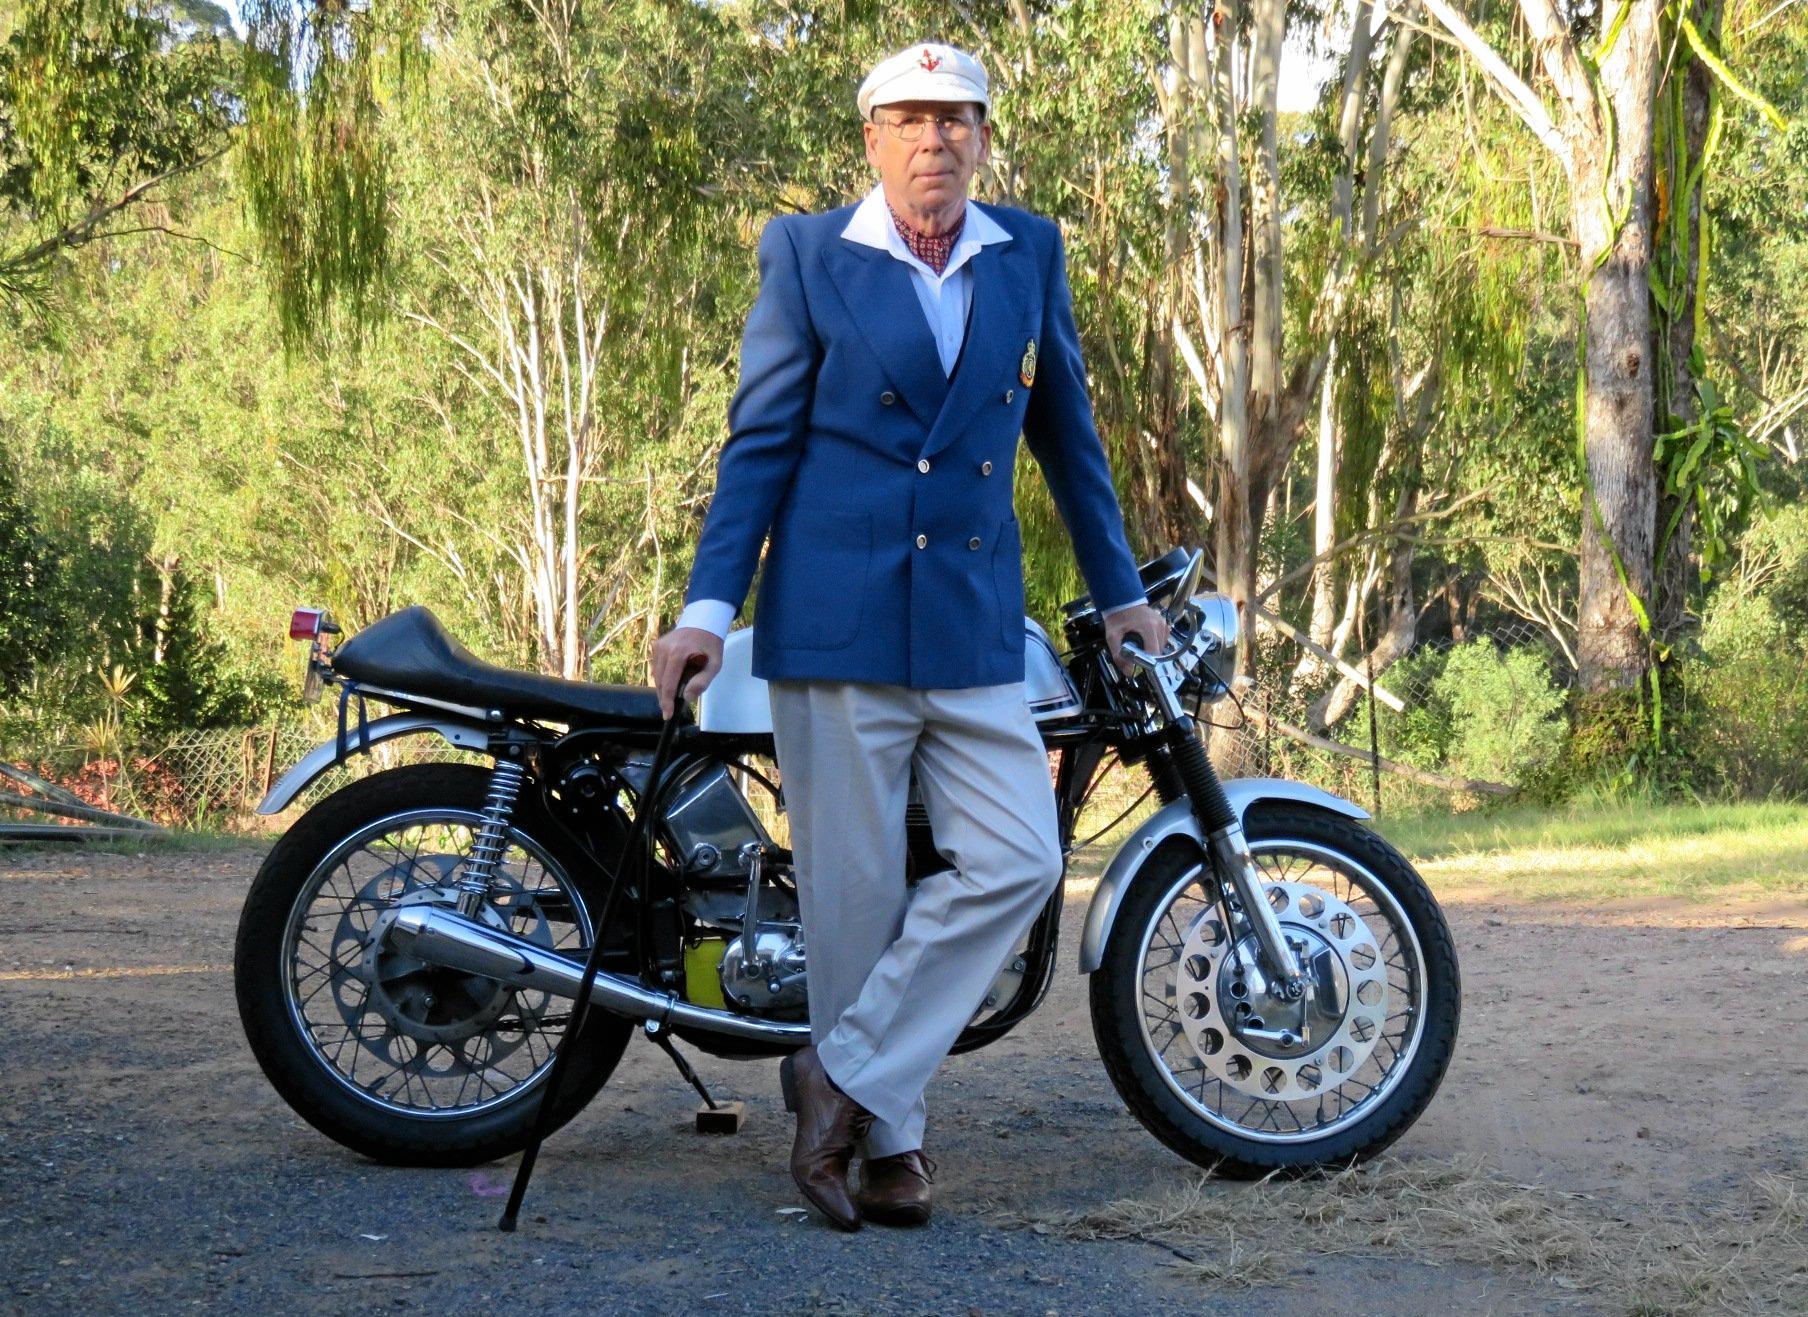 BACK ON THE BIKE: Despite a nasty accident, Graham got back on the bike for charity.